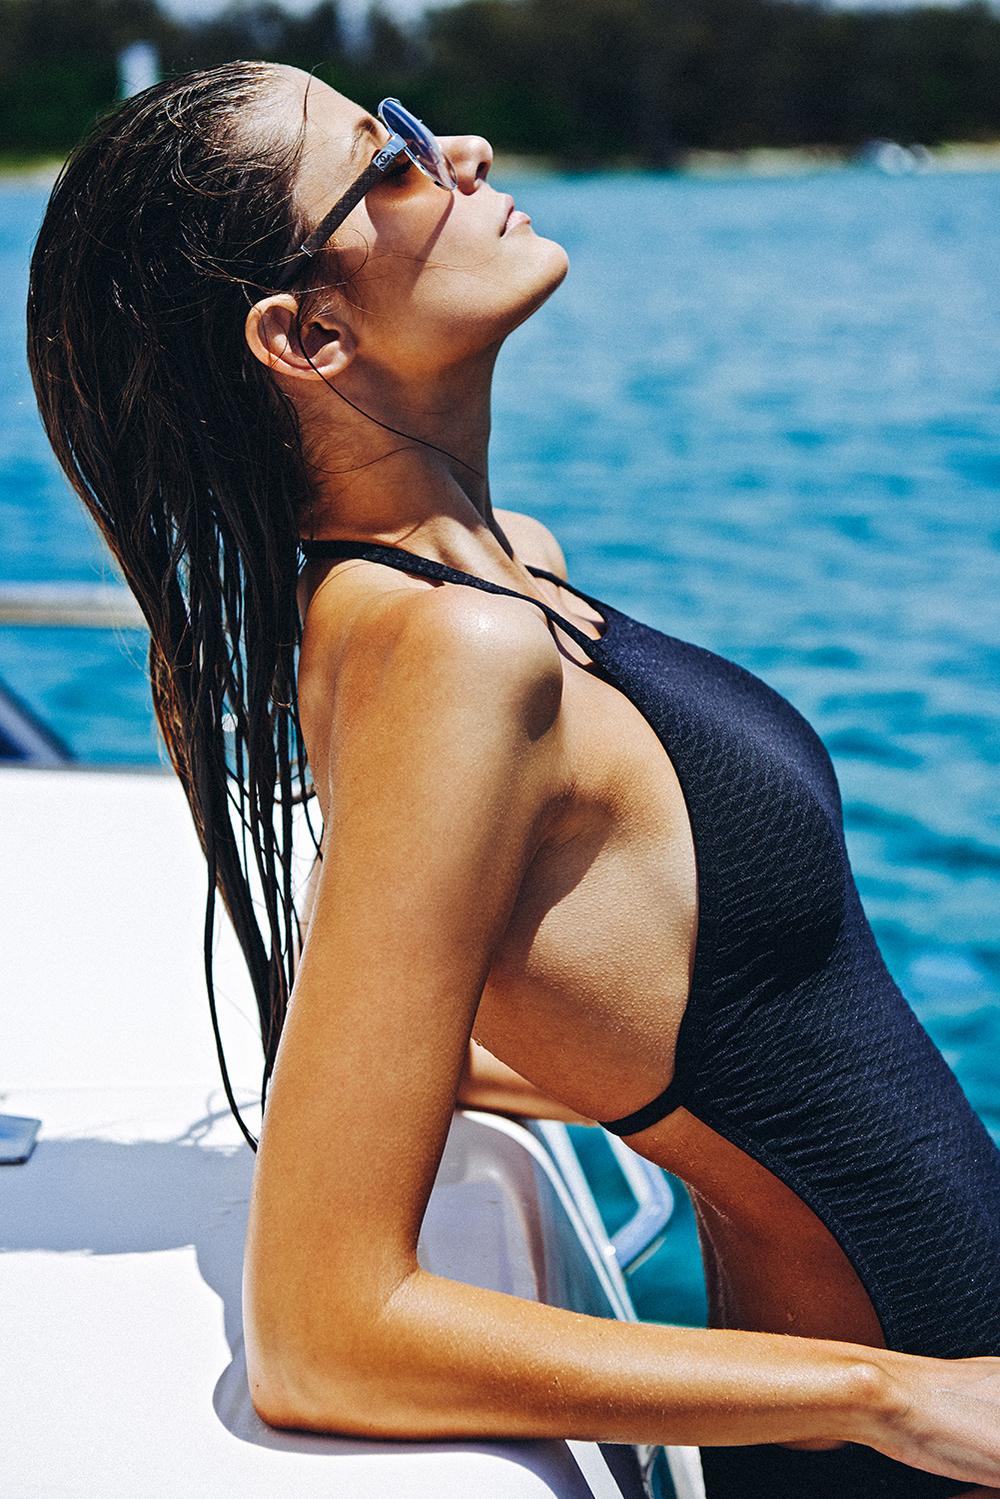 Michelle-McNamee-Dallys-Models-Brisbane-Mark-SullivanBradley.jpg